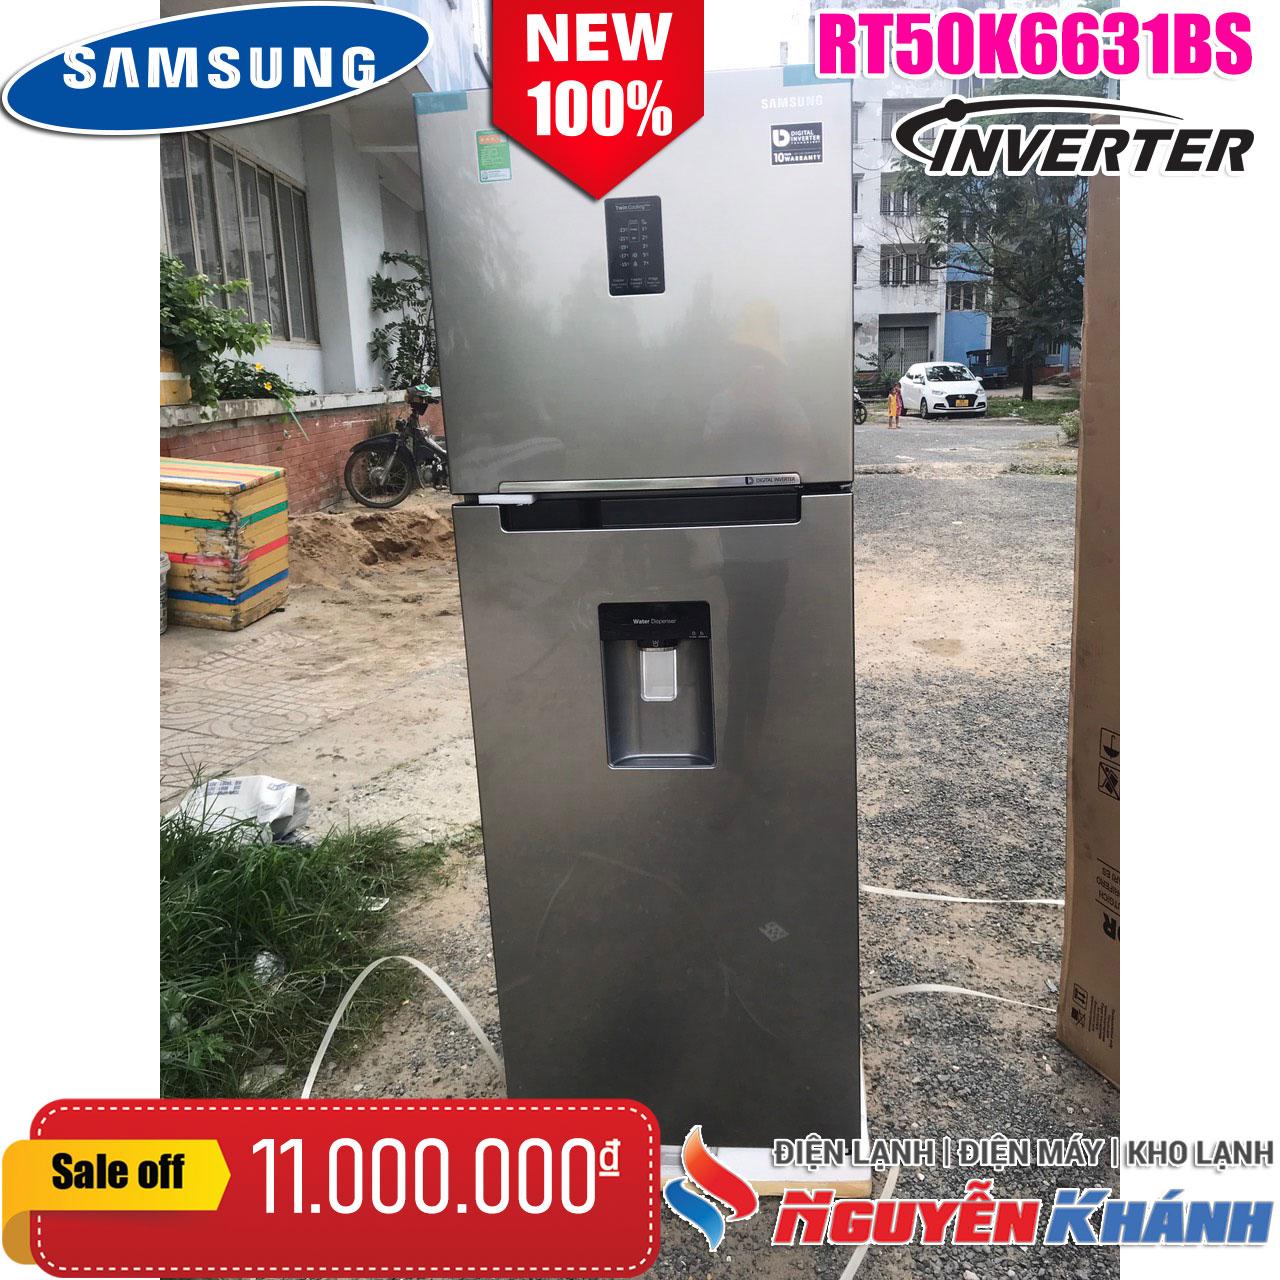 Tủ lạnh Samsung InverterRT50K6631BS